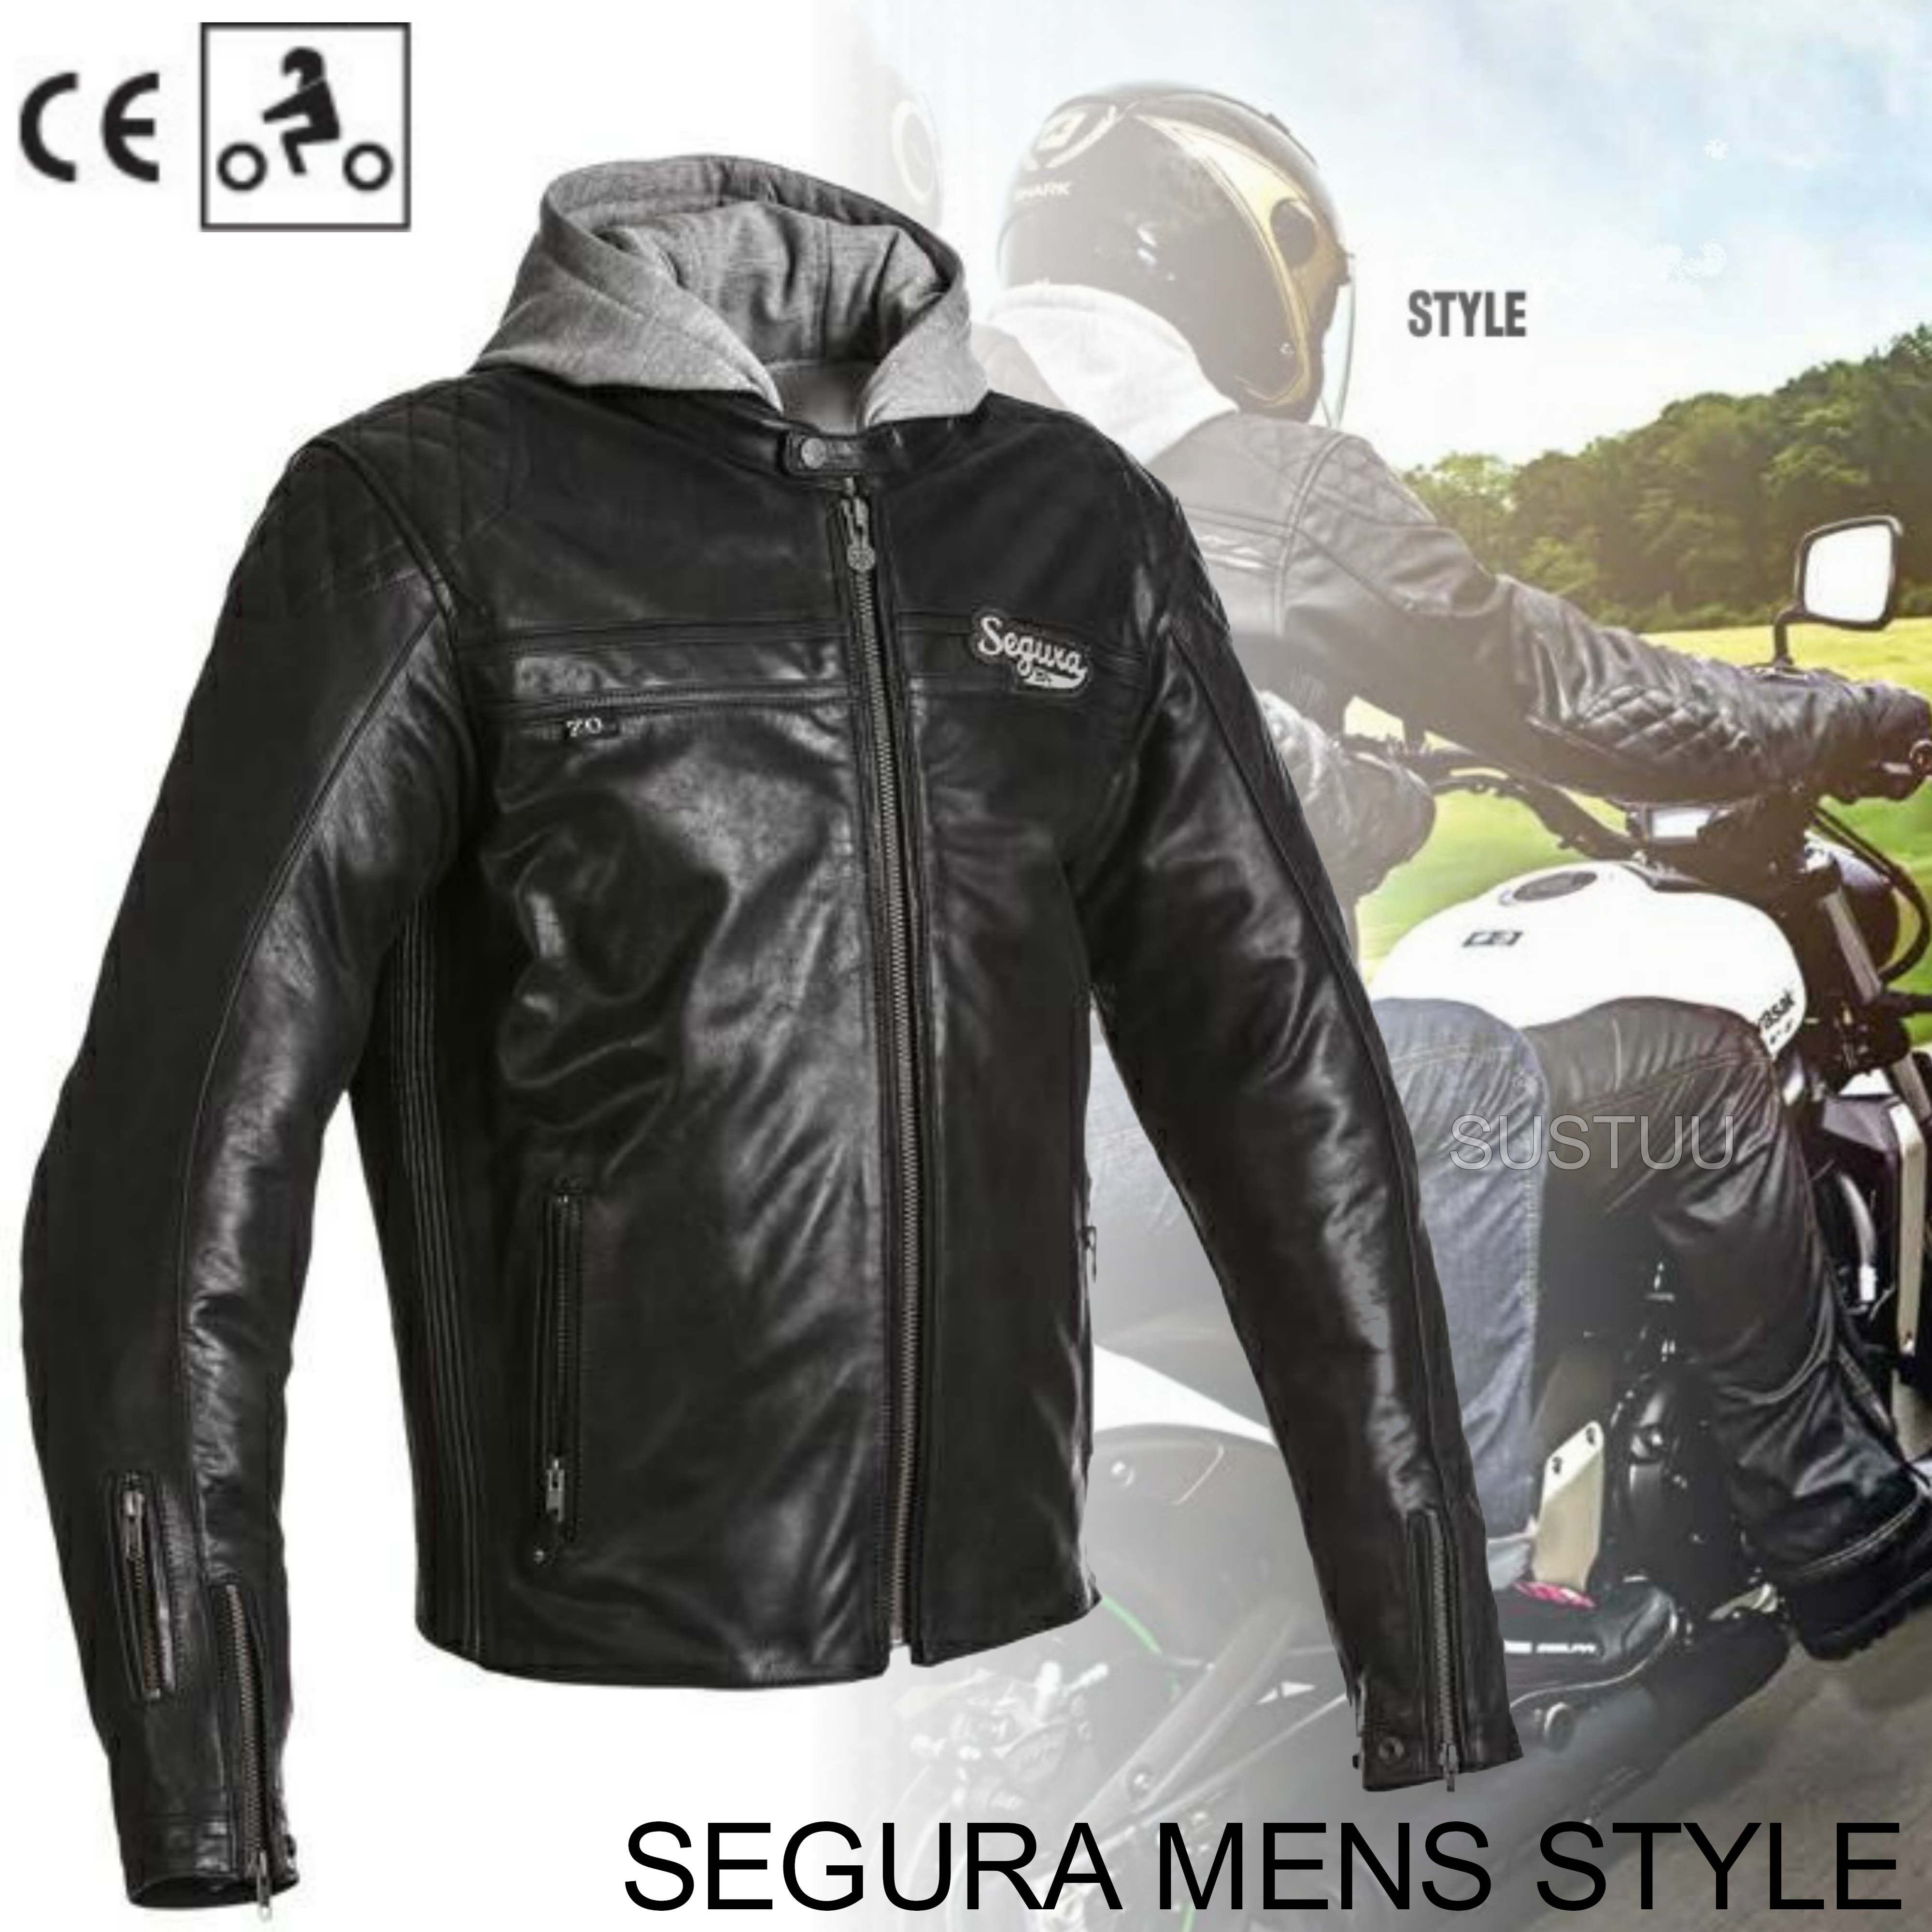 Segura Mens Style Motorcycle/Bike Hoodie Jacket|Cowhide Leather|CE Approved|Black